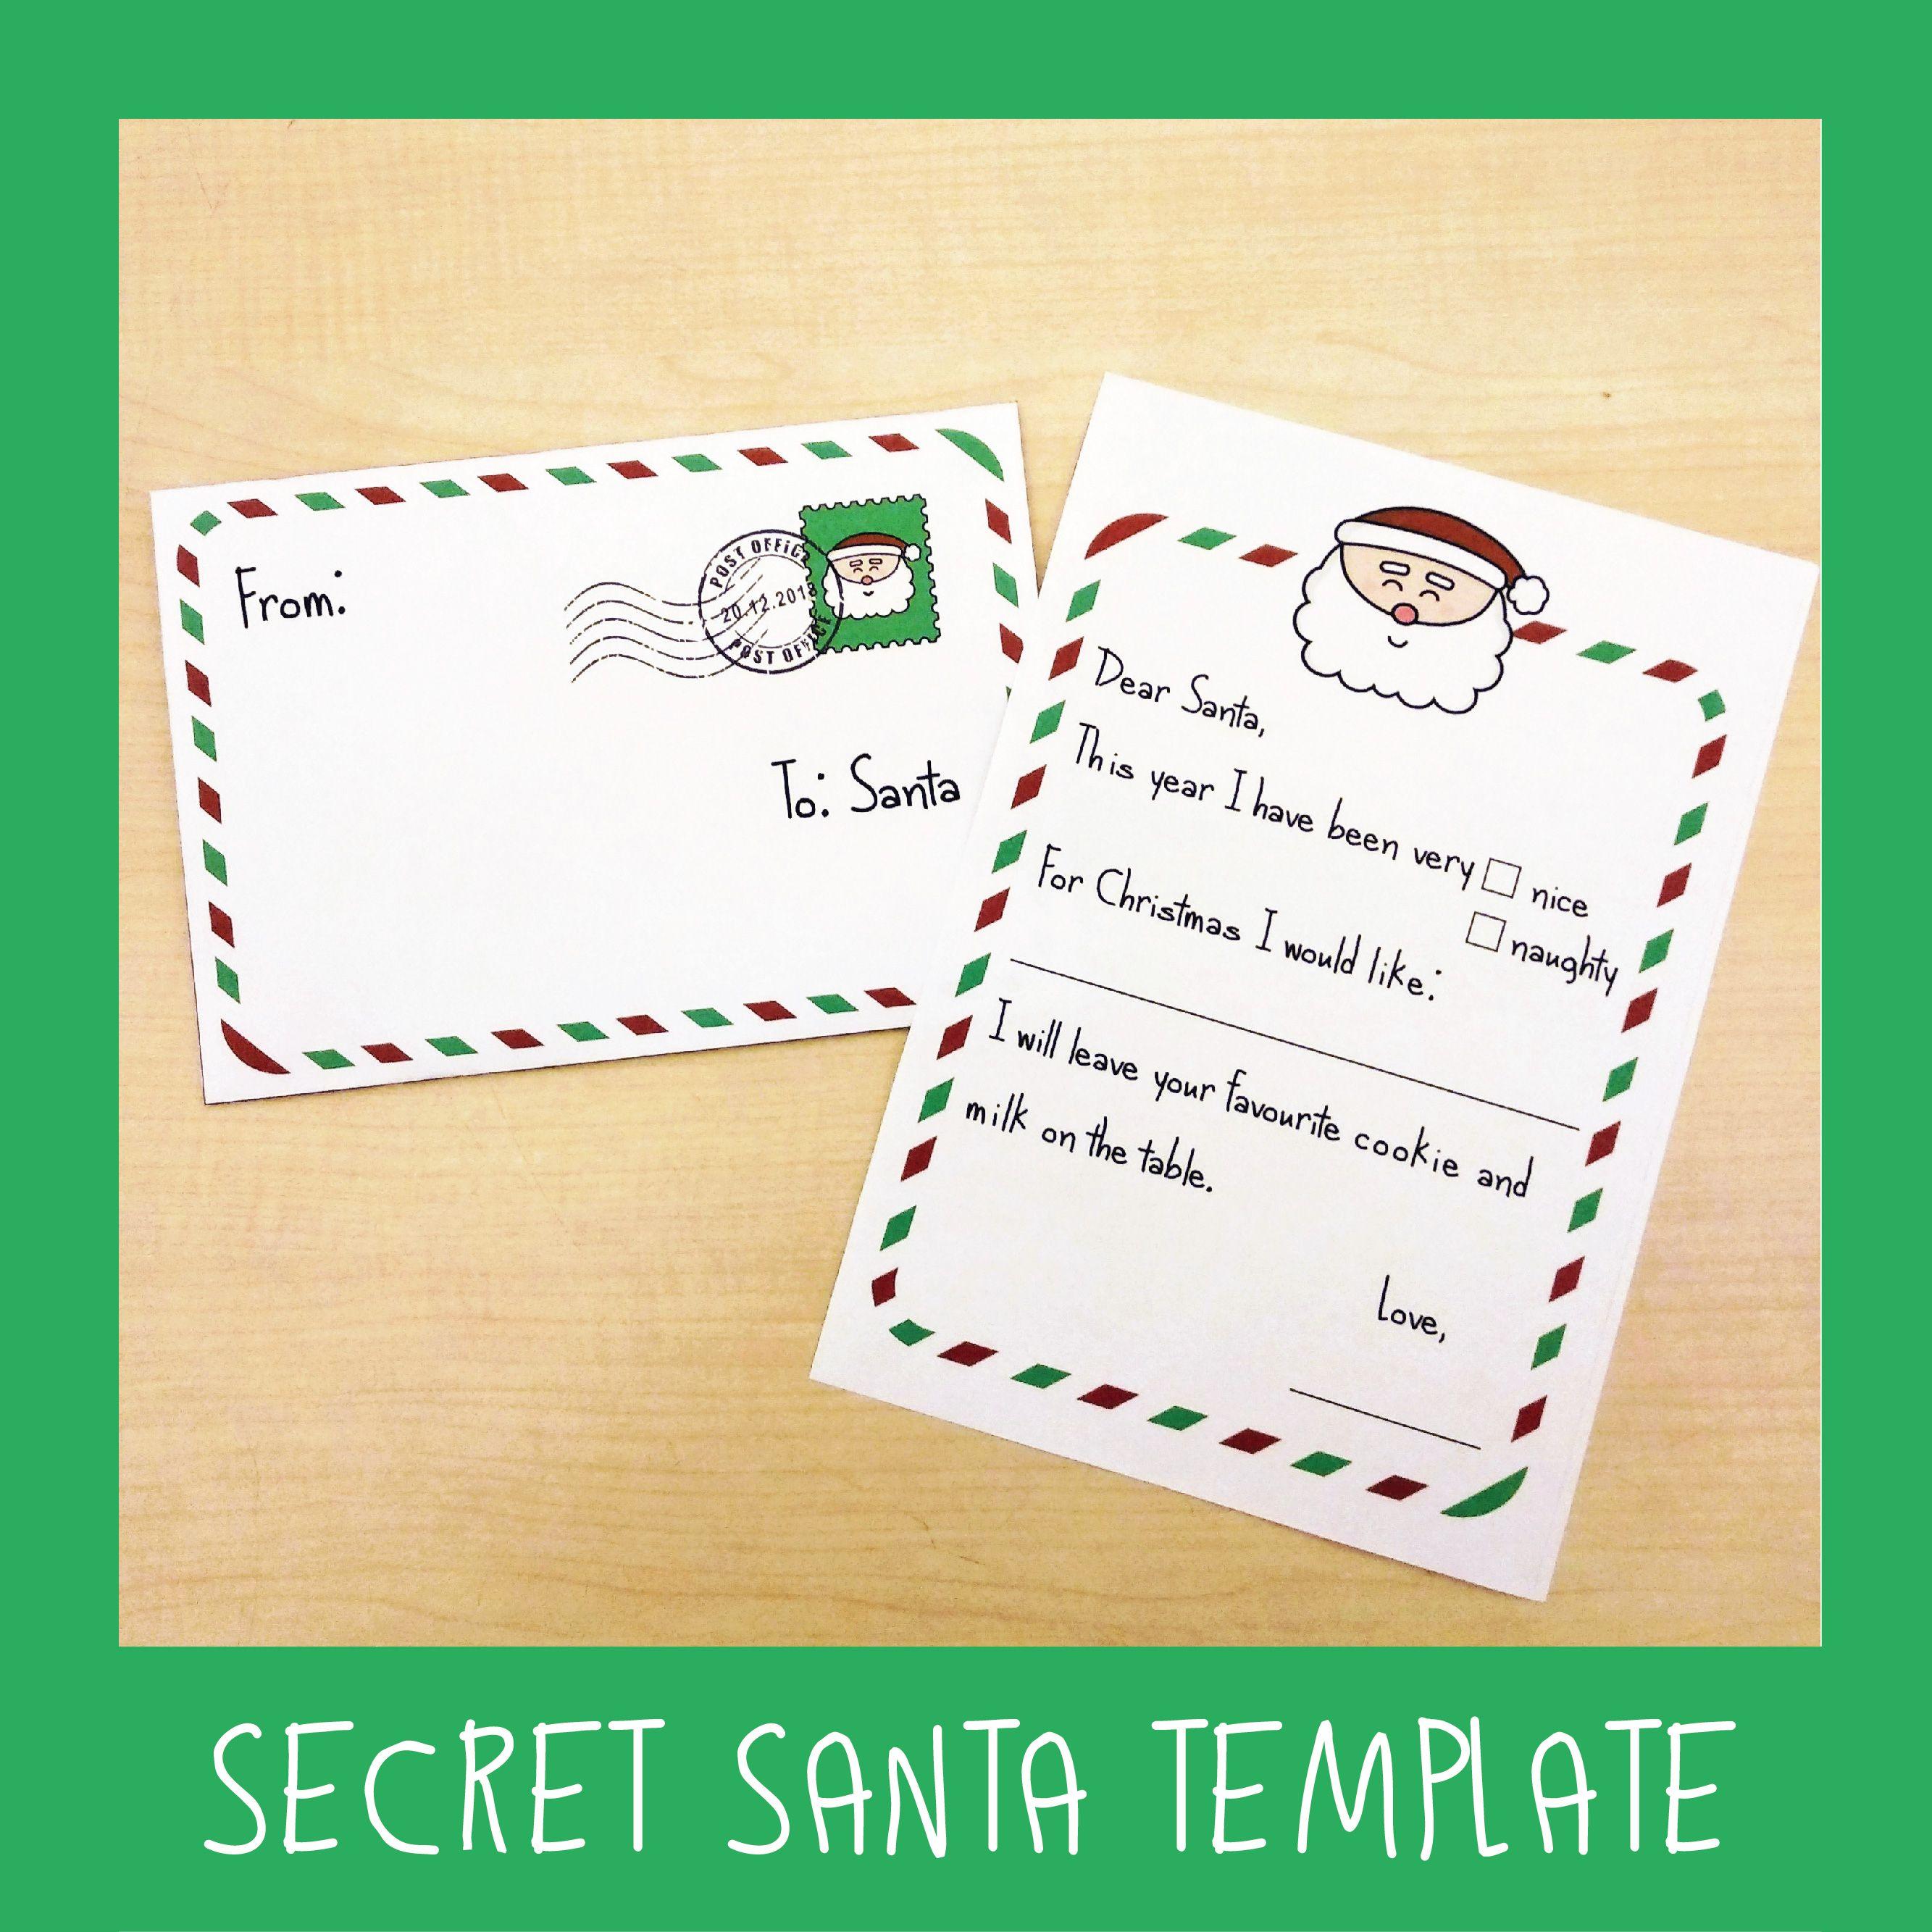 Free Secret Santa Template Santa Letter Template Santa Letter Secret Santa Templates